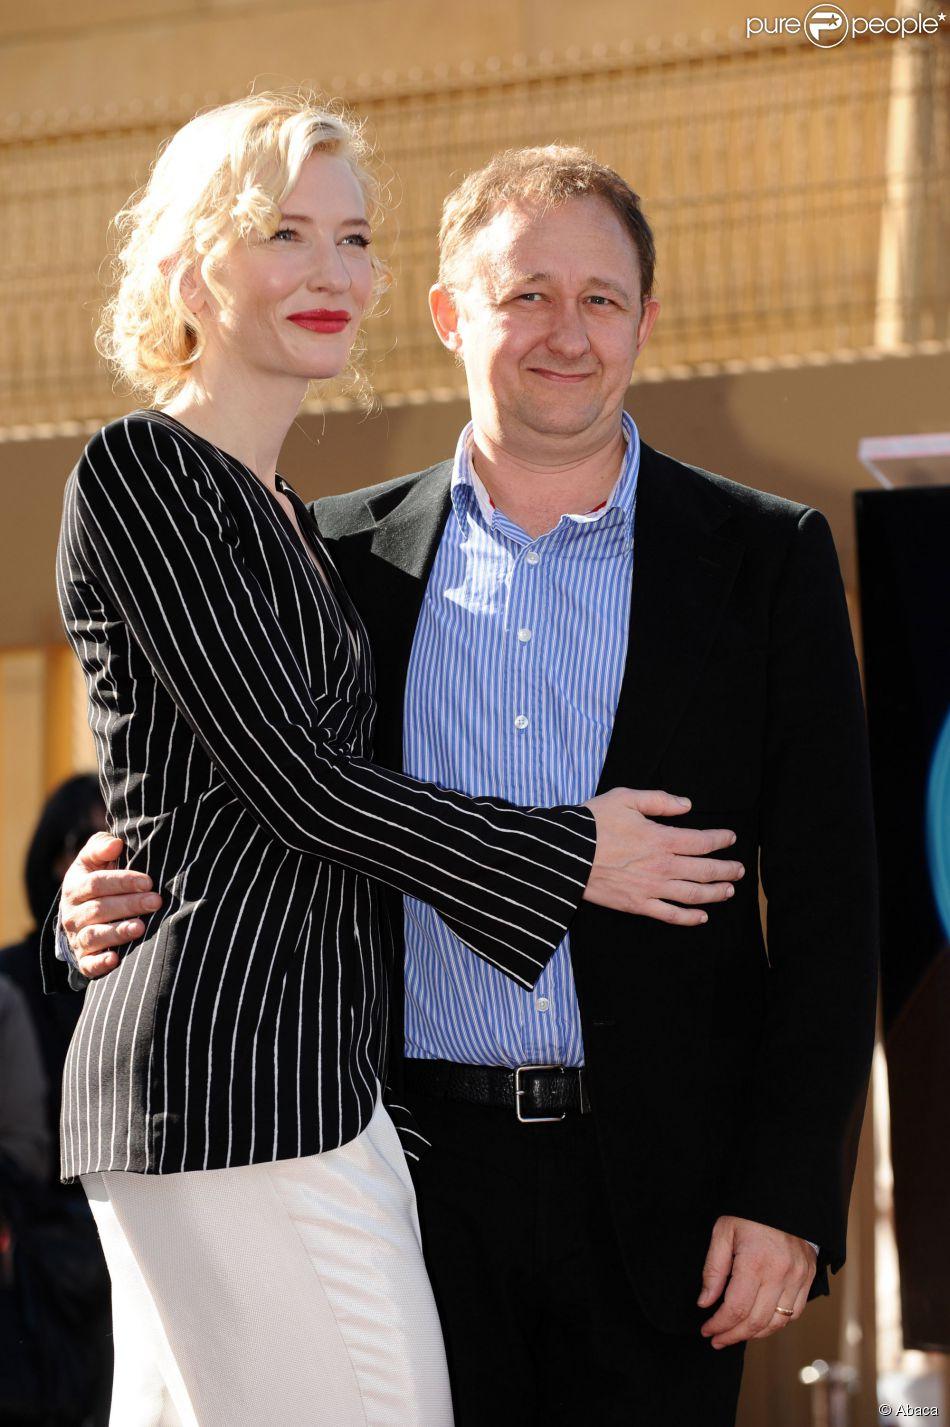 Cate Blanchett sur le Hollywood Walk of Fame avec son mari Andrew Upton, Los Angeles, le 5 décembre 2008.